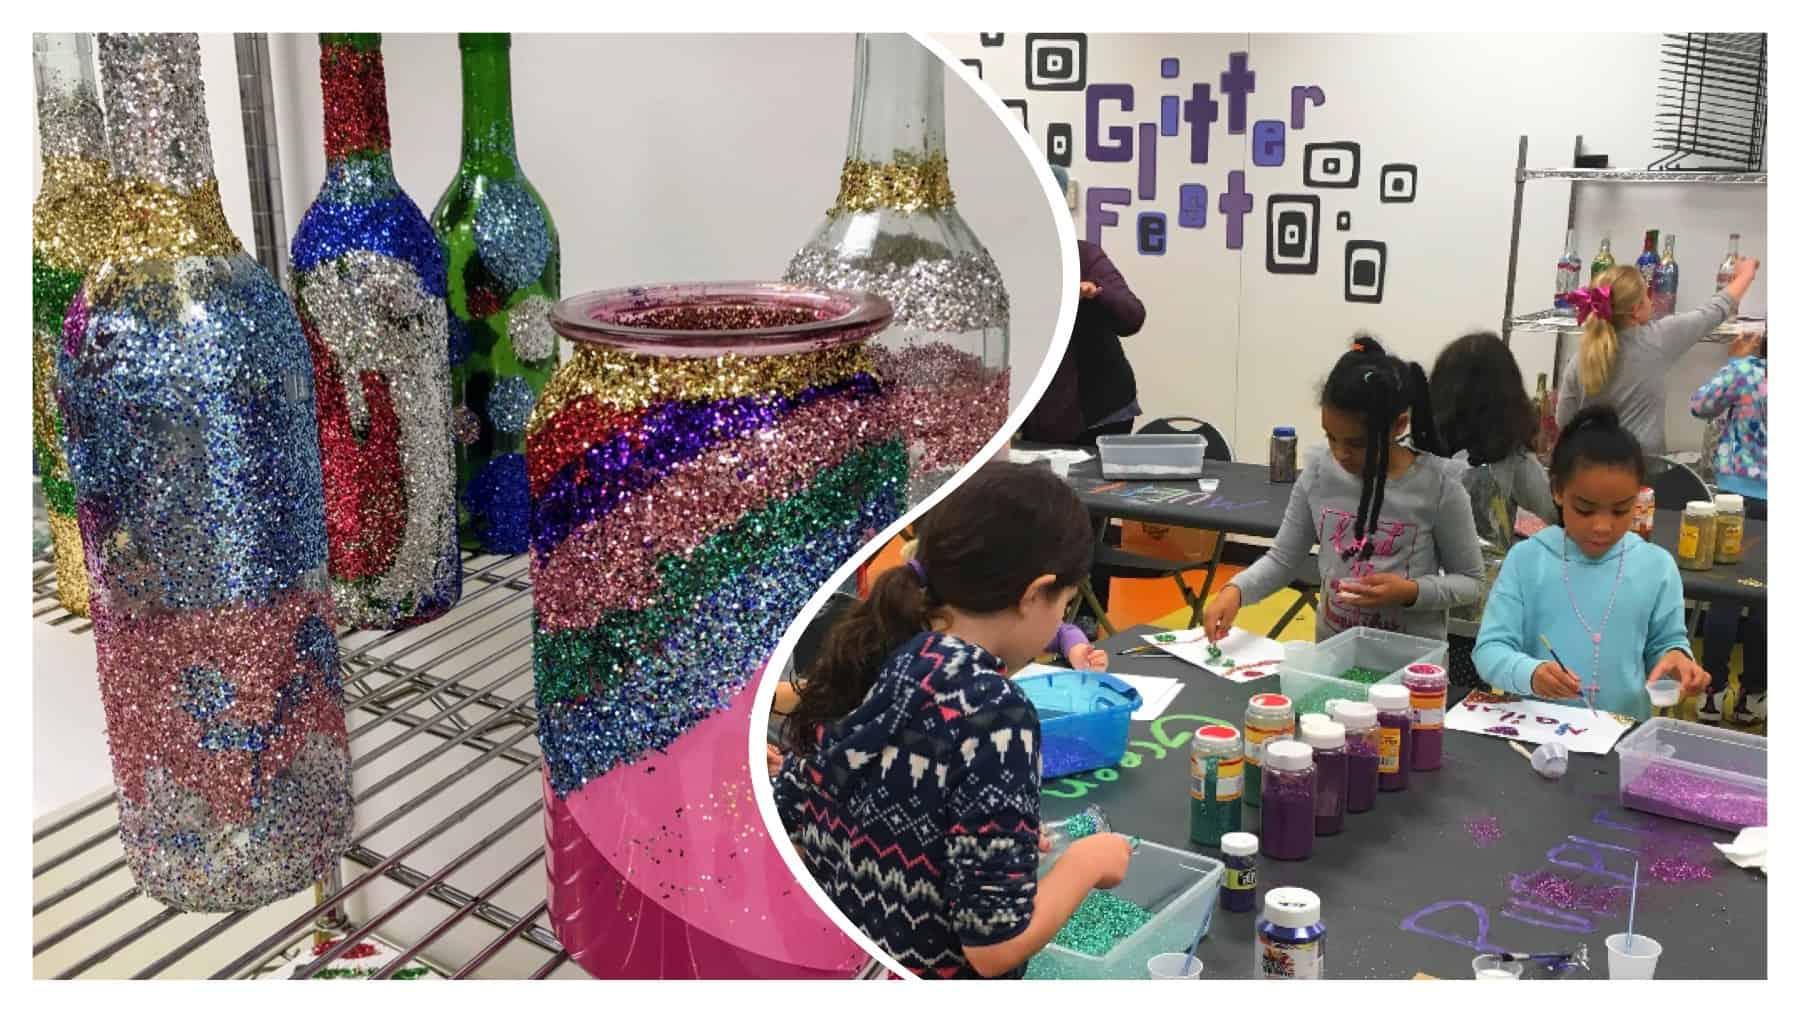 Glitterfest fun at Brentwood Arts Exchange